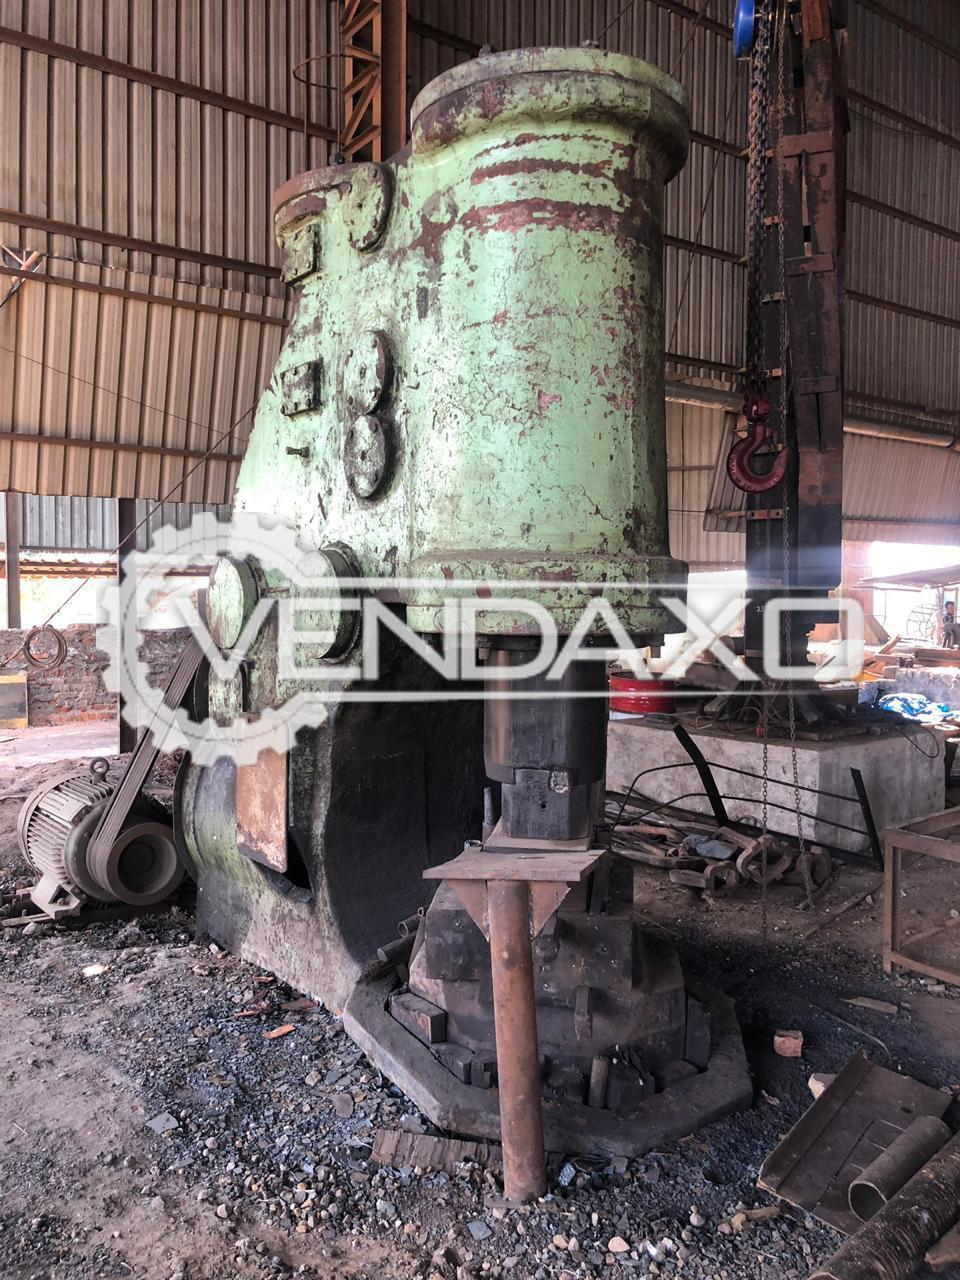 Anyang Make C41-1000 Industrial Pneumatic Forging Hammer - Motor Power - 75 KW